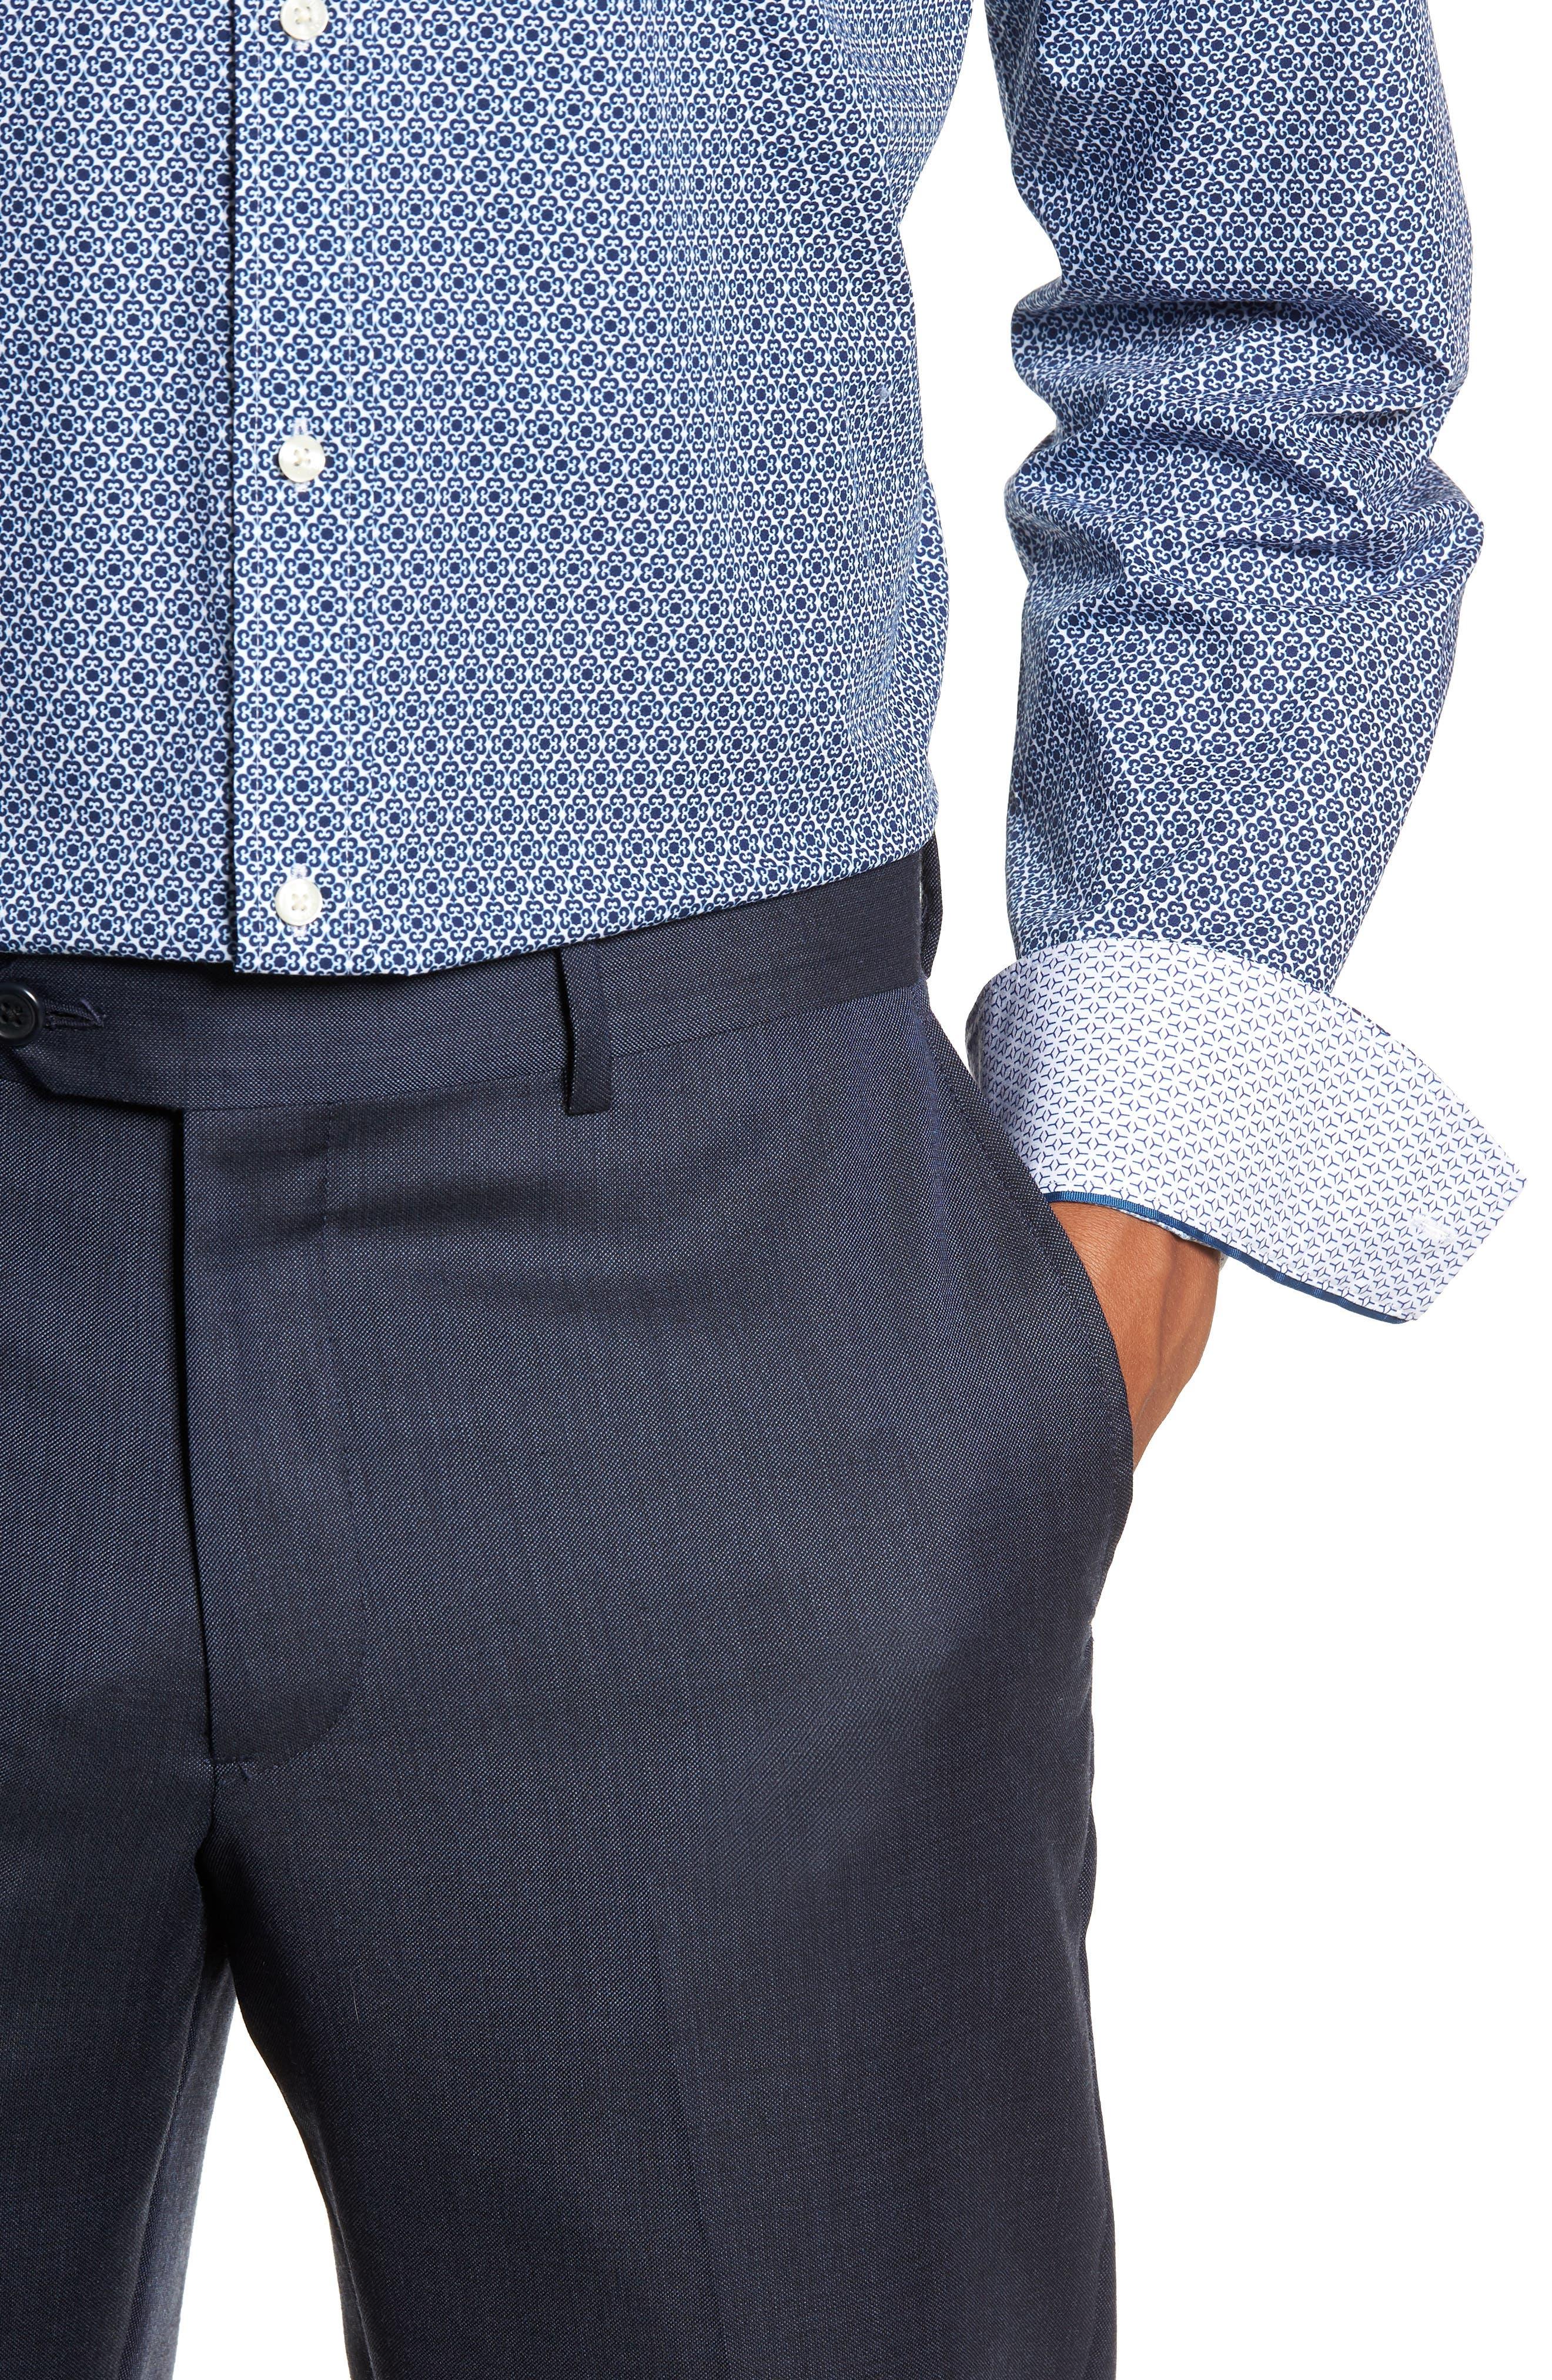 Slestmi Slim Fit Print Dress Shirt,                             Alternate thumbnail 2, color,                             BLUE